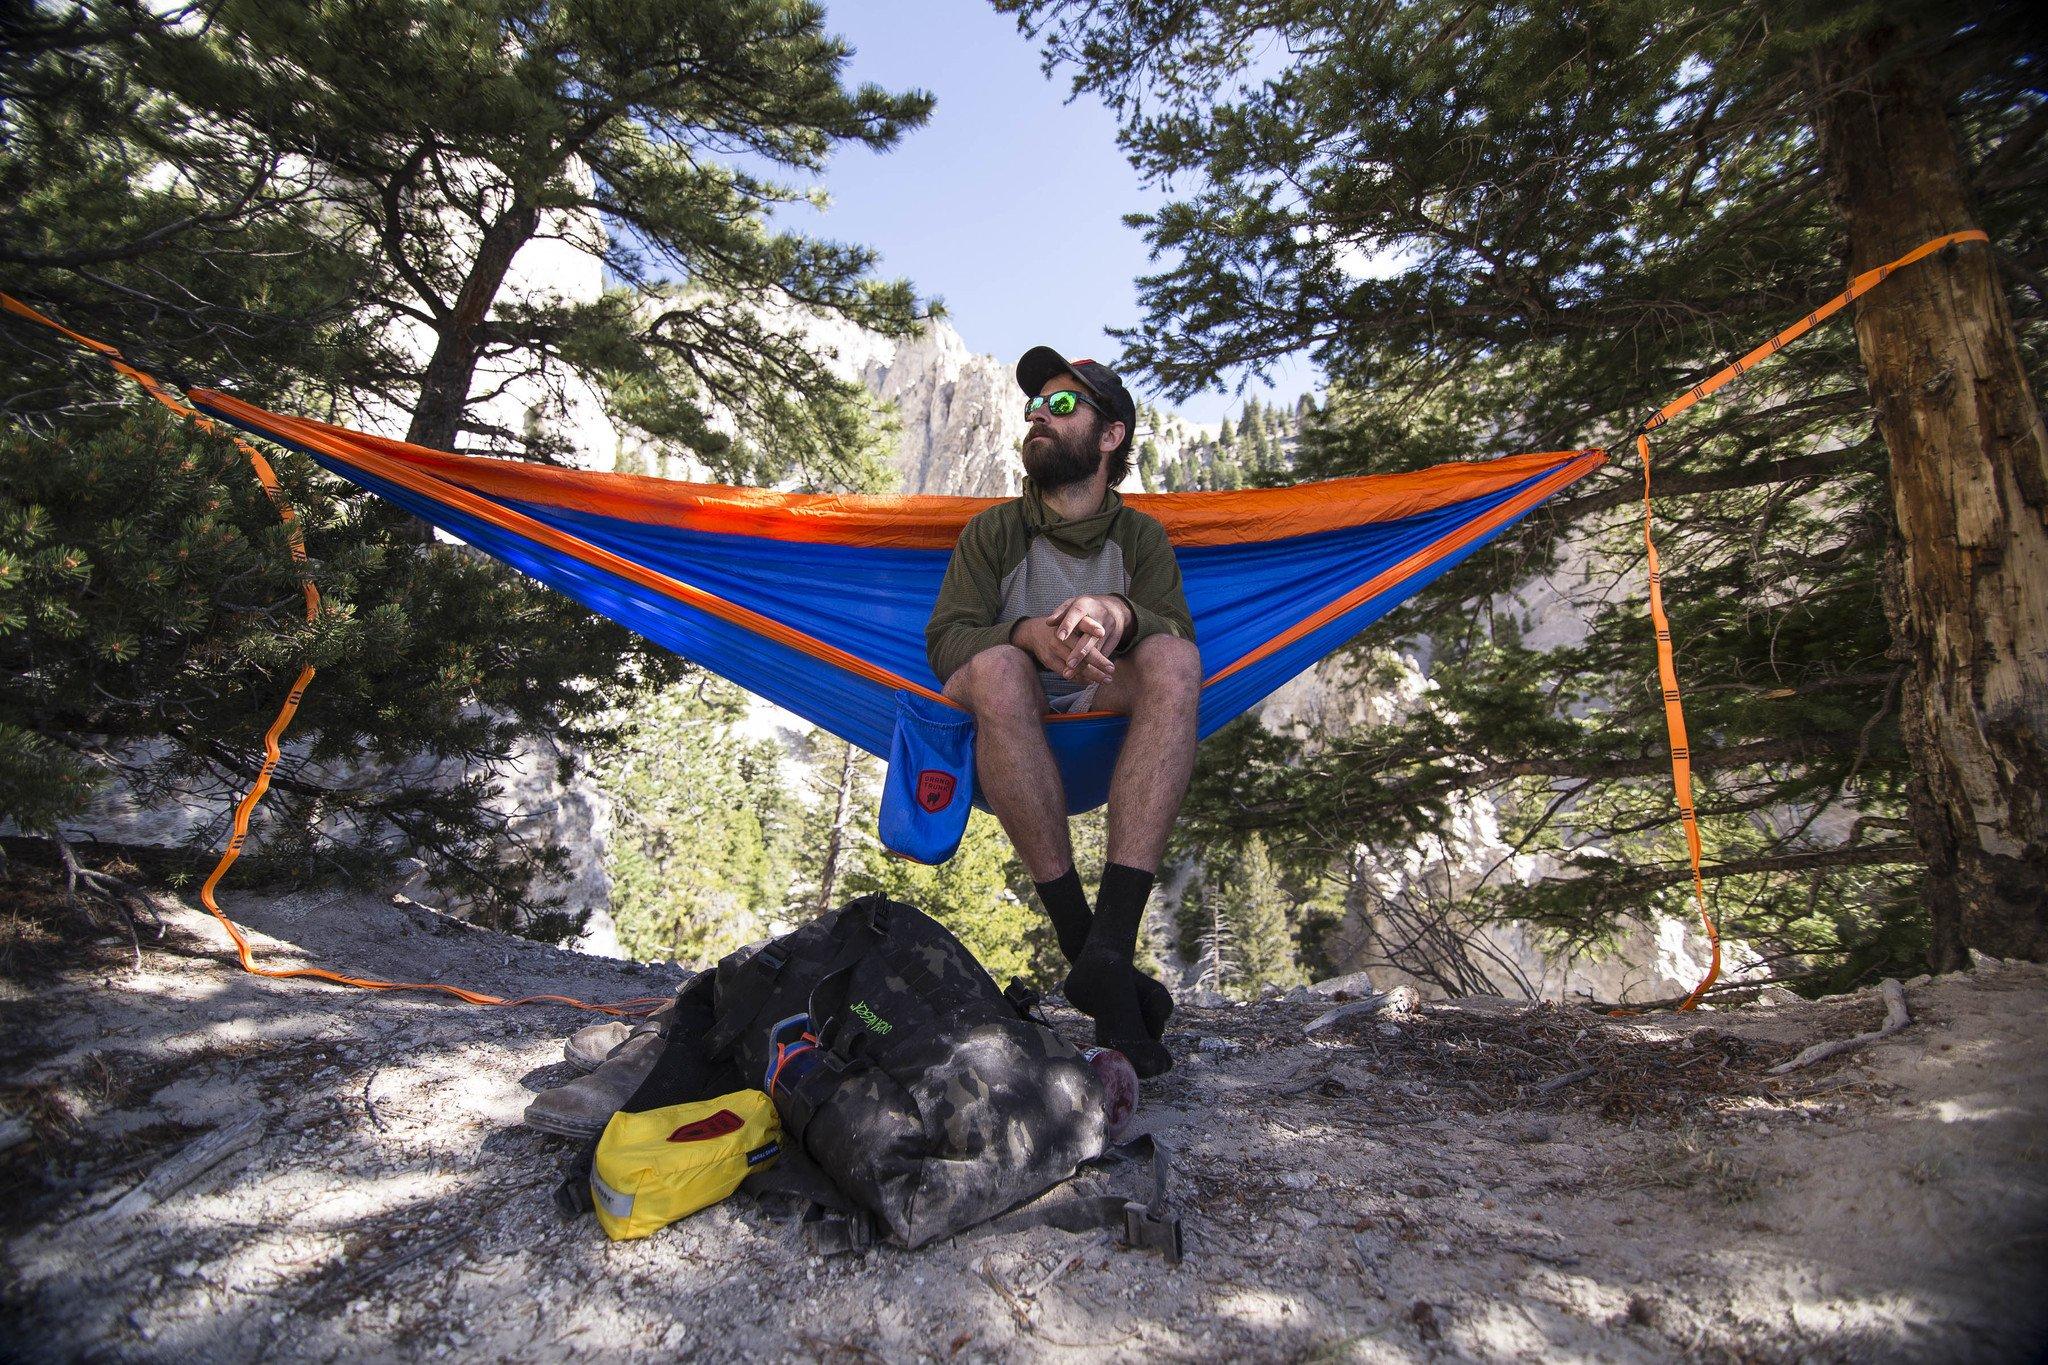 nylon hammock.jpg